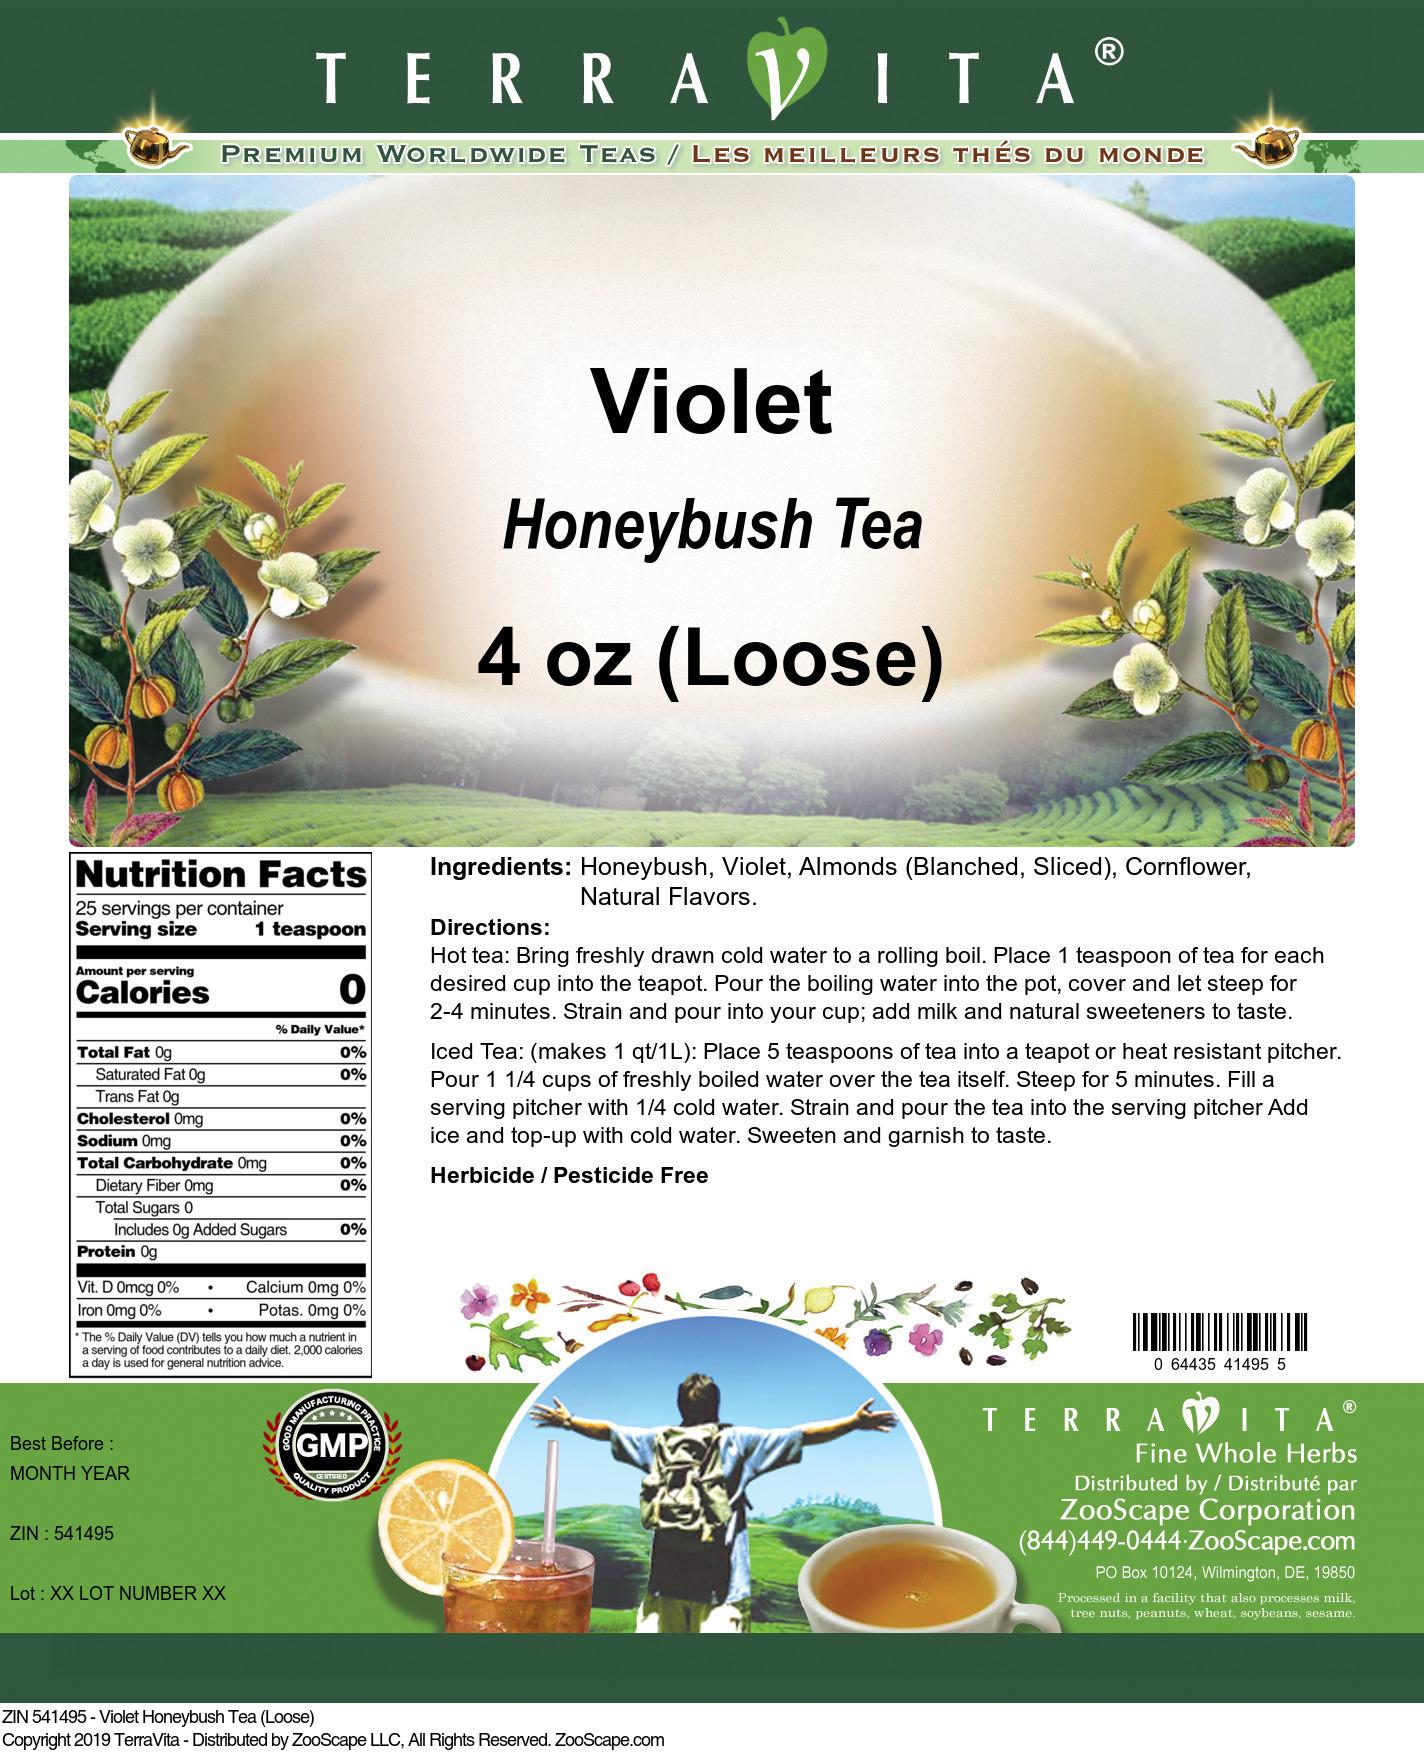 Violet Honeybush Tea